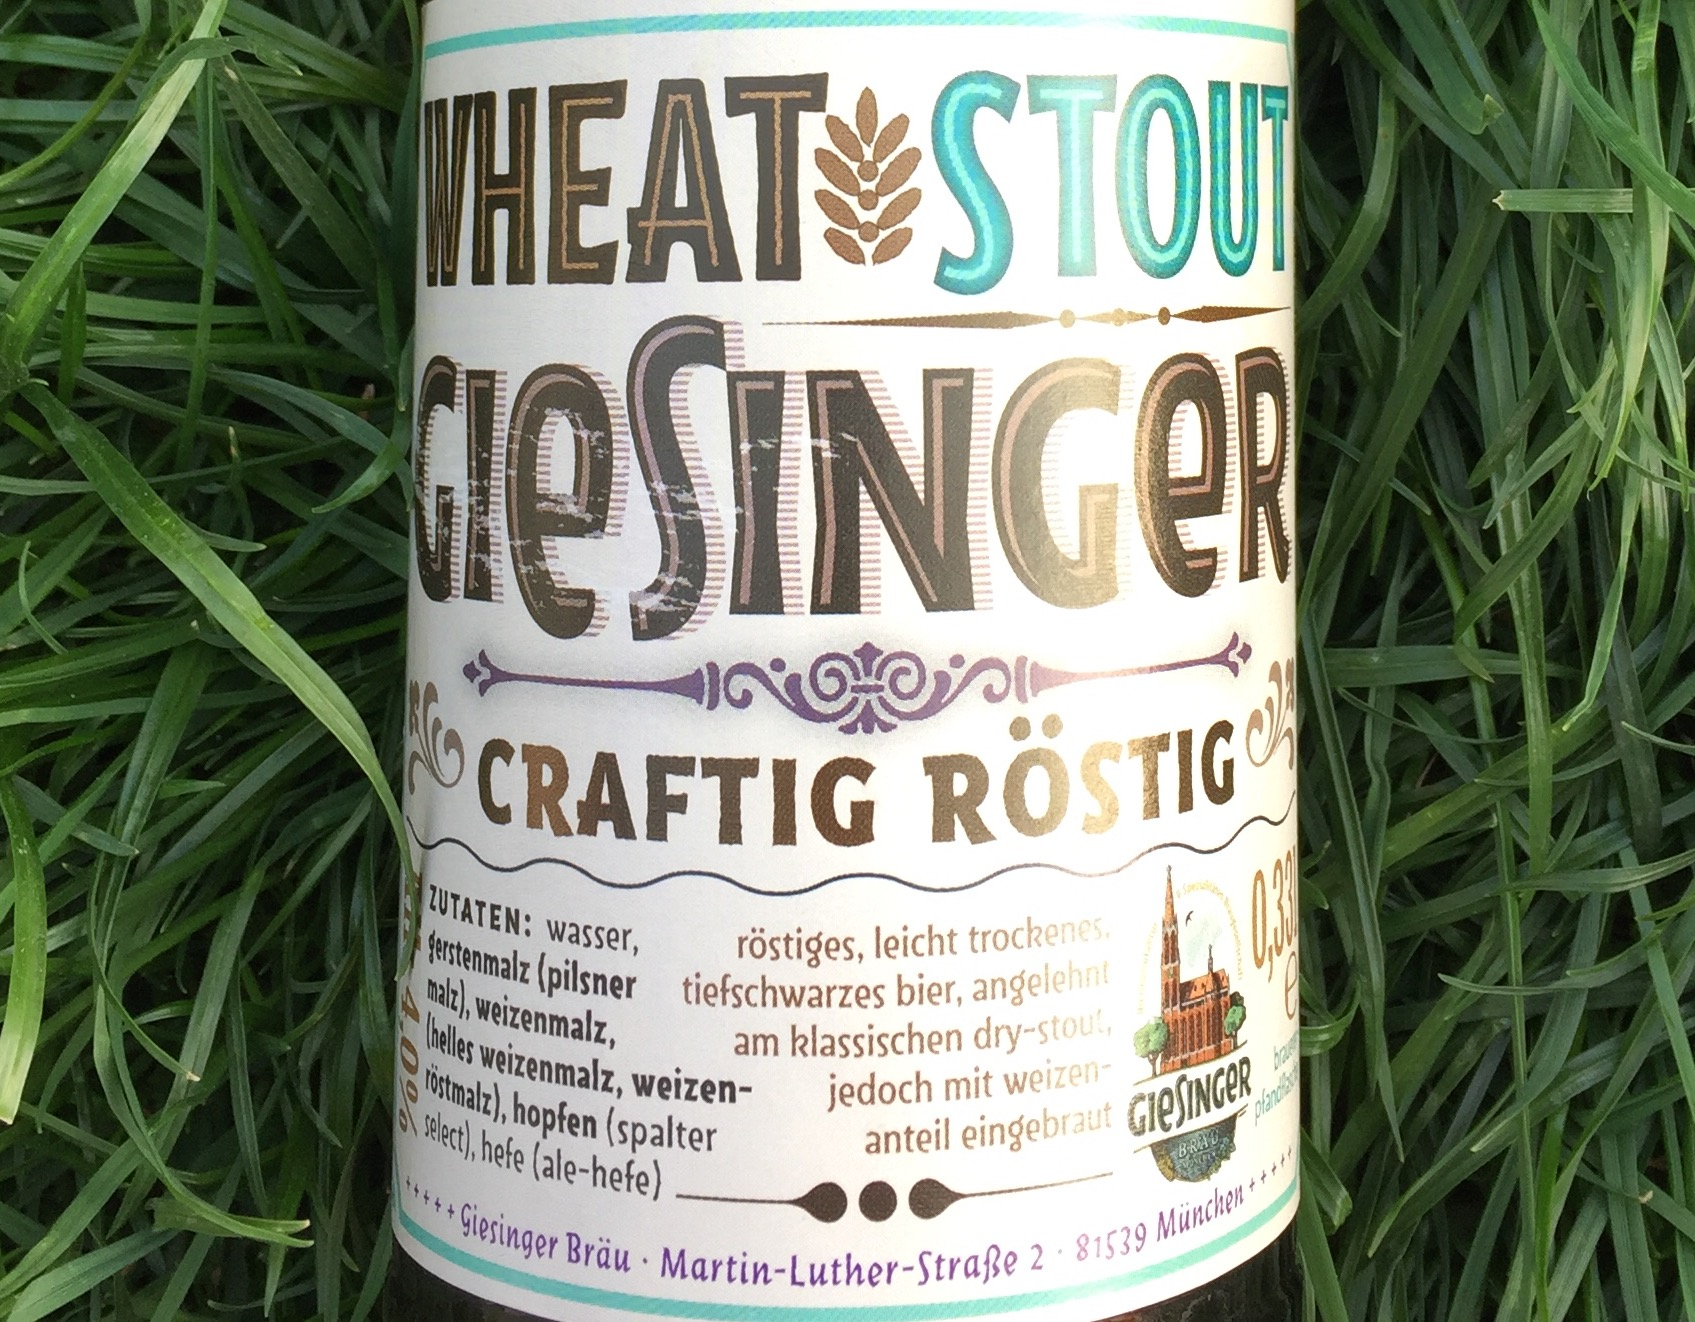 Giesinger - Wheat Stout